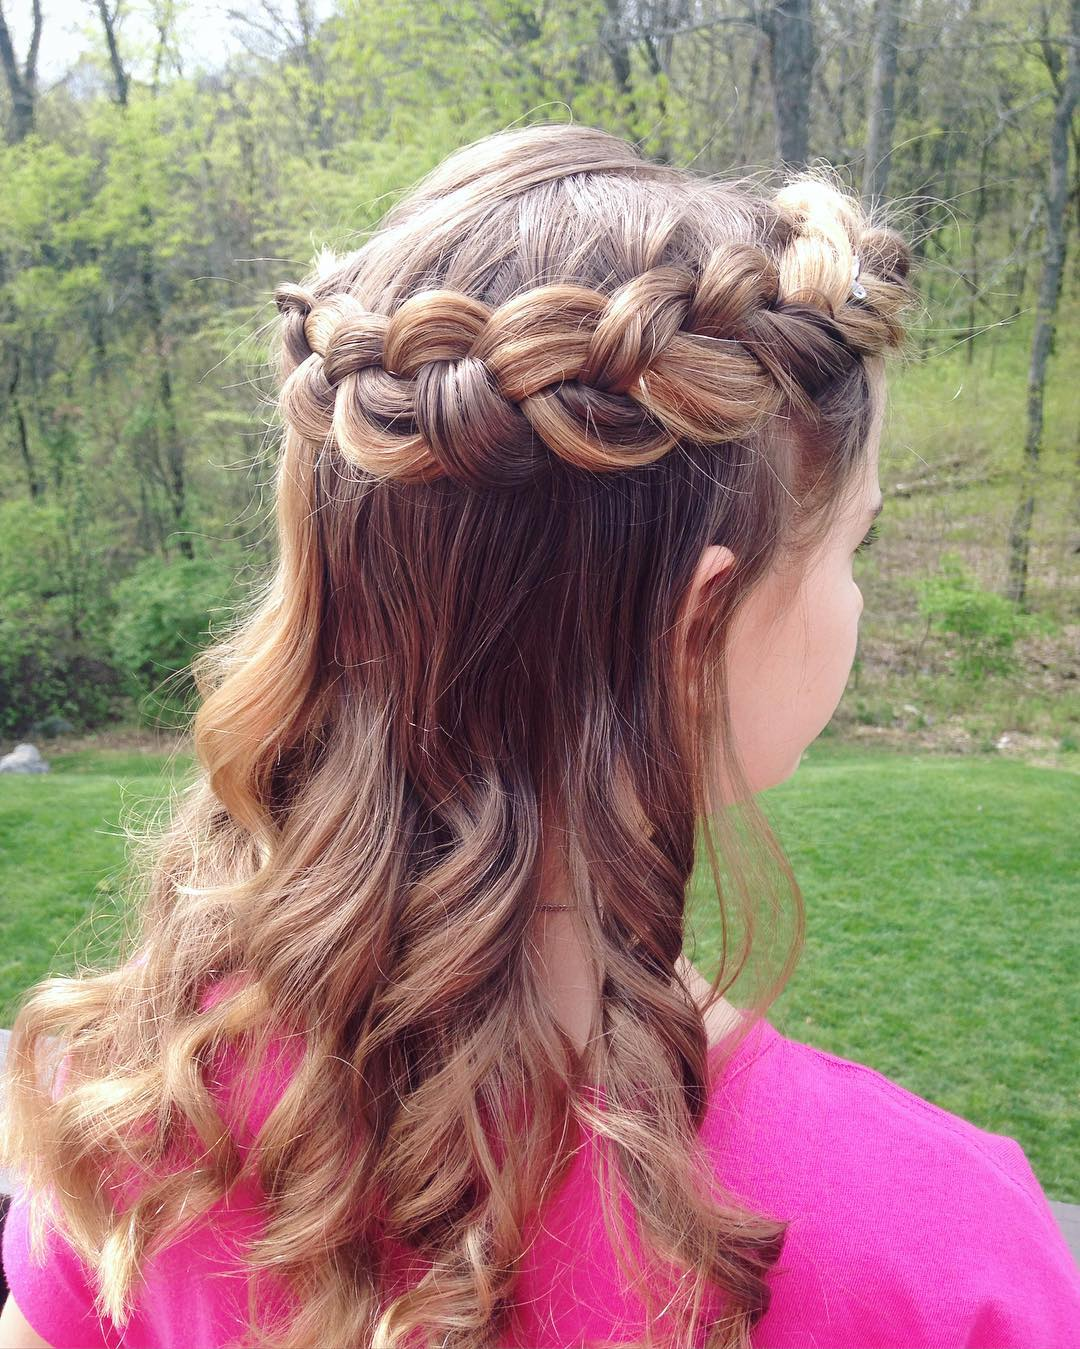 75 Cute Girls Hairstyles - Best Cute Hairstyles for Girls 2021